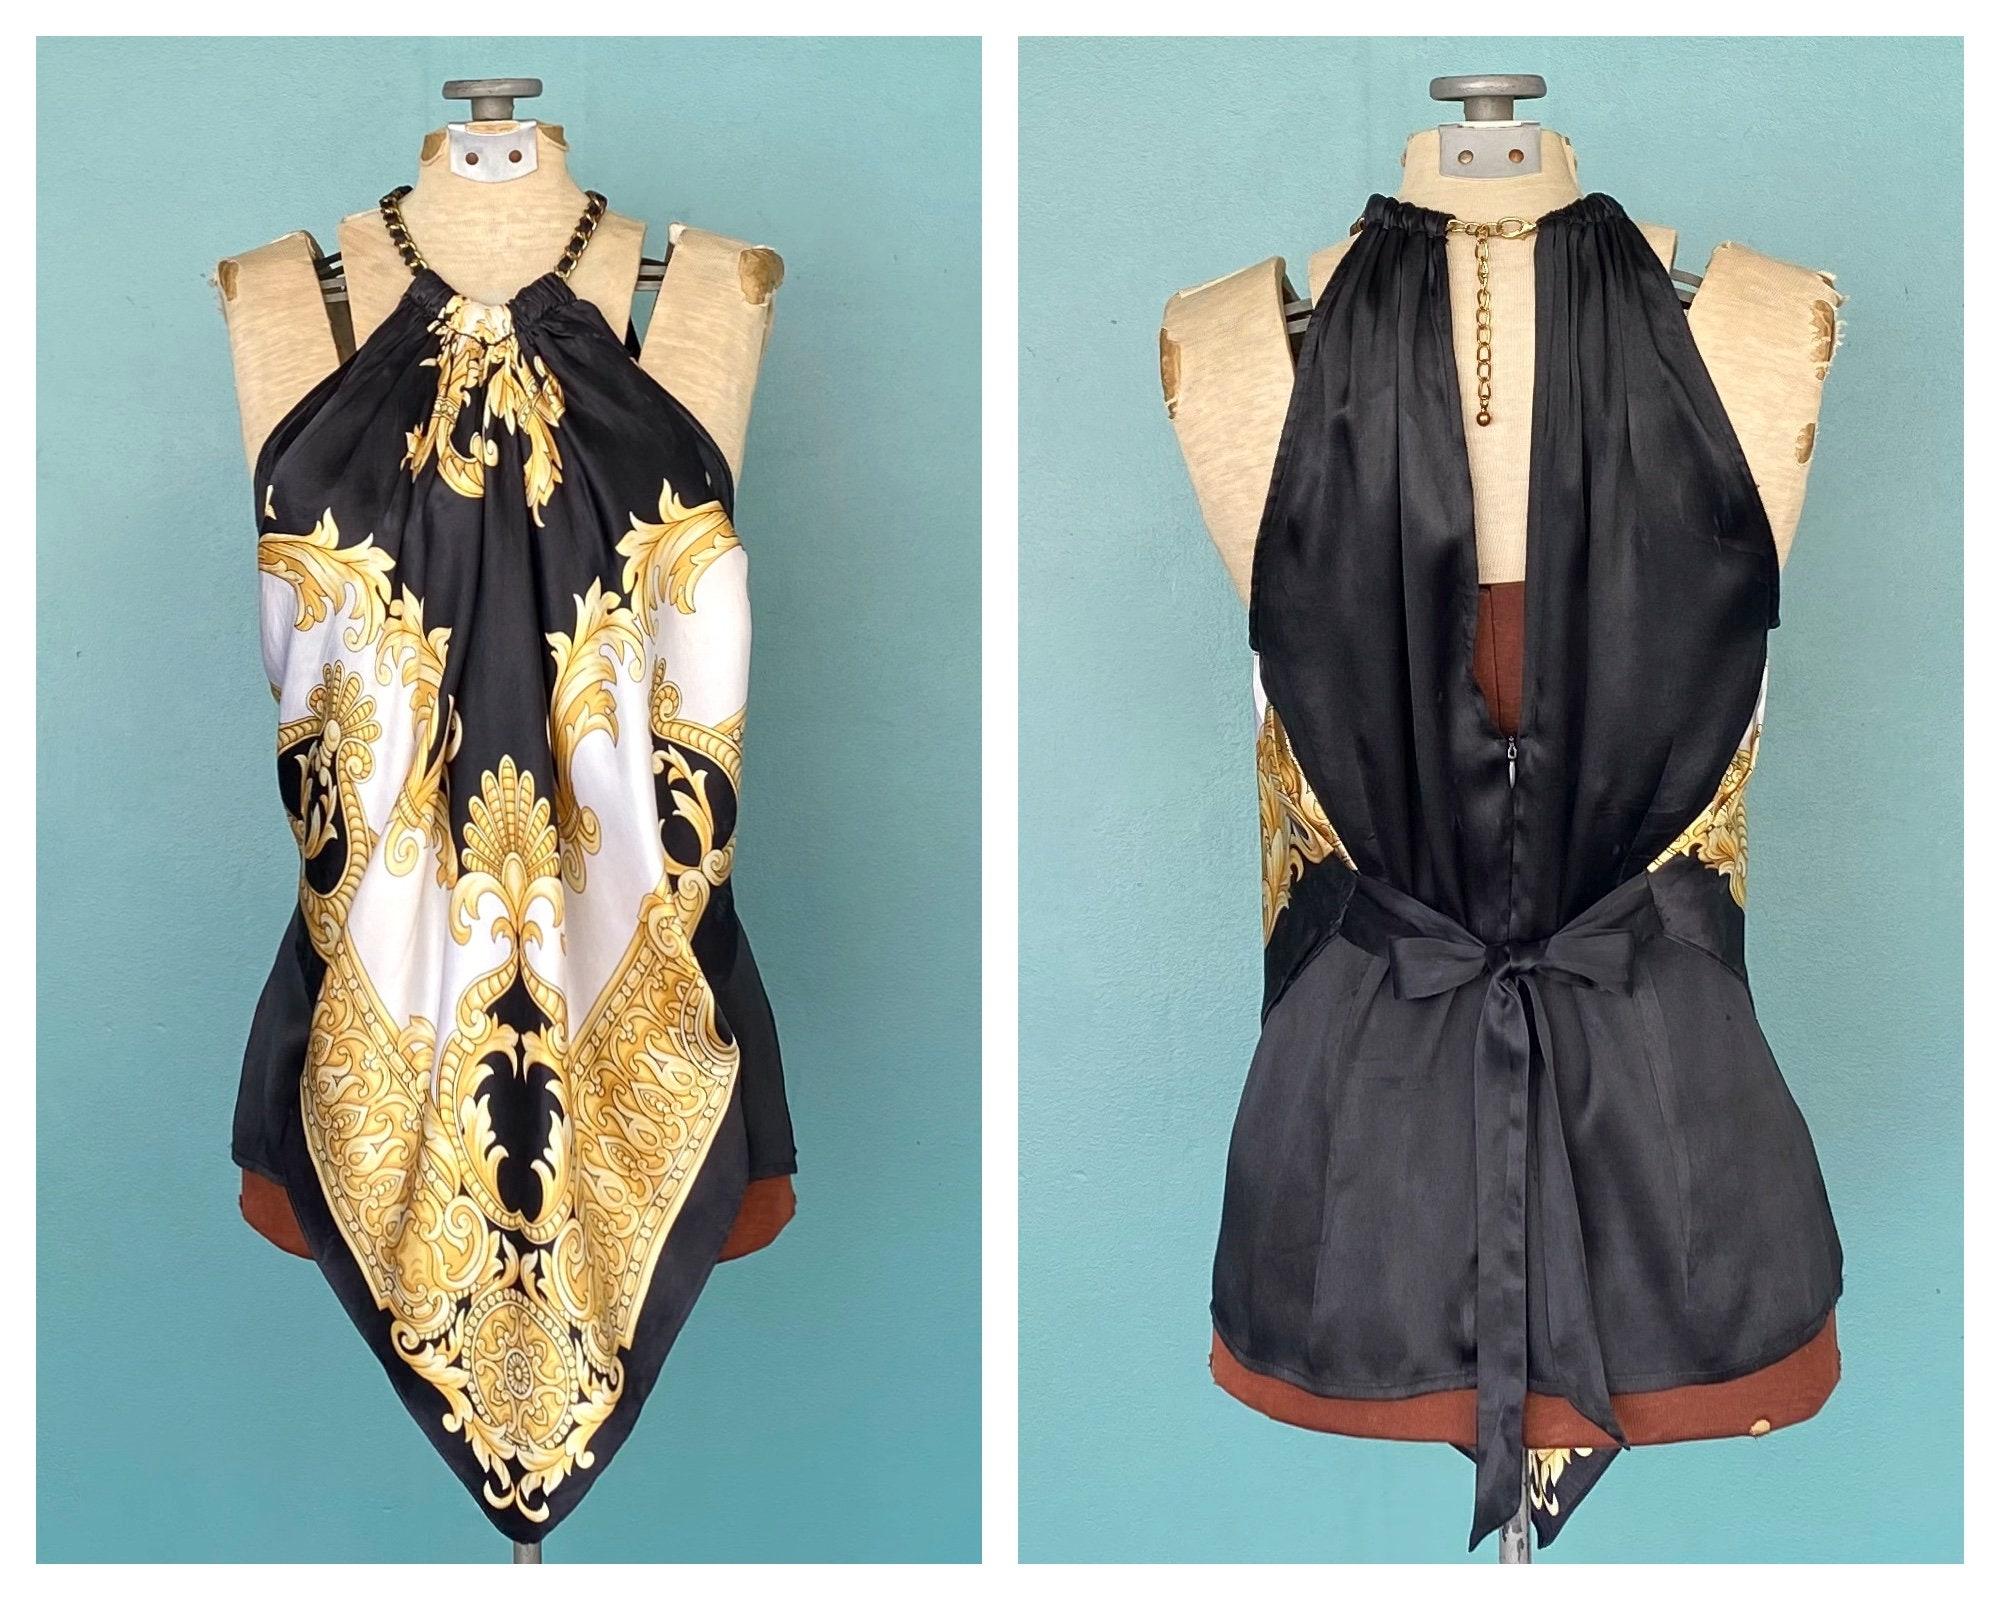 Vintage Scarf Styles -1920s to 1960s Baroque Silk Y2K Halter Tank Scarf Top Vintage Black Sleeveless Womens Asymmetric Taralynevansstudio $0.00 AT vintagedancer.com